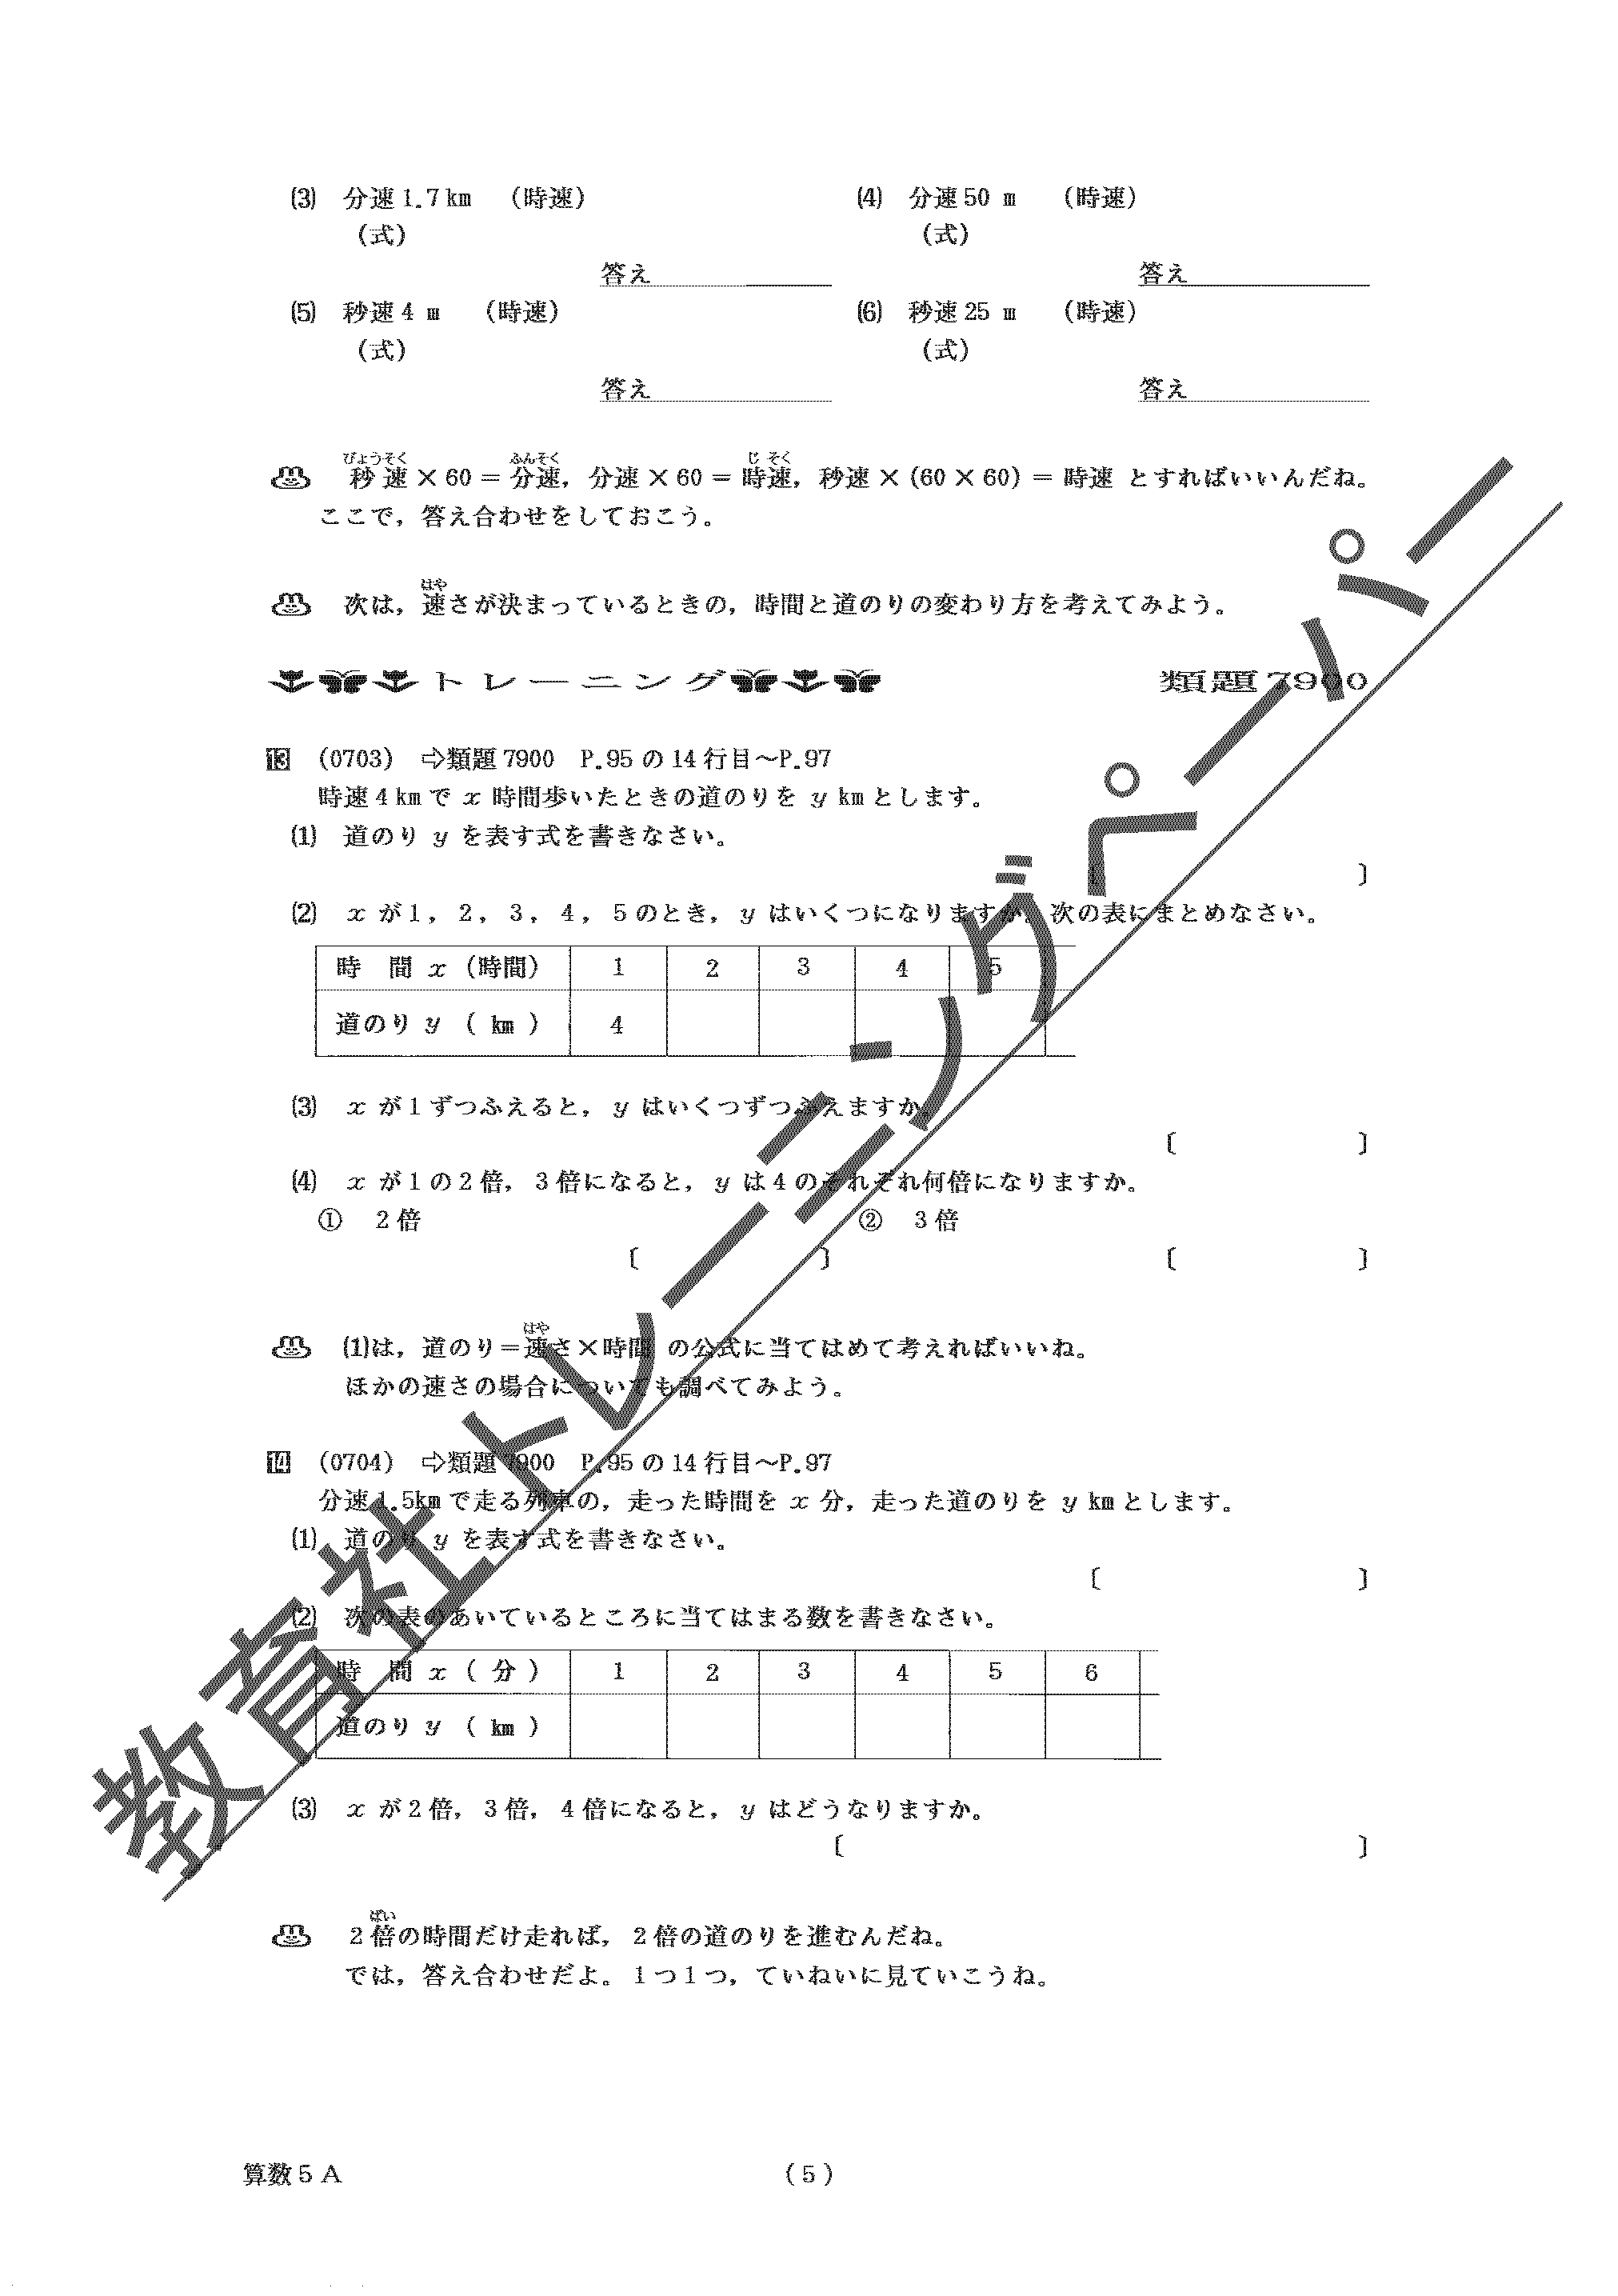 ITEM-S5SANSU-007